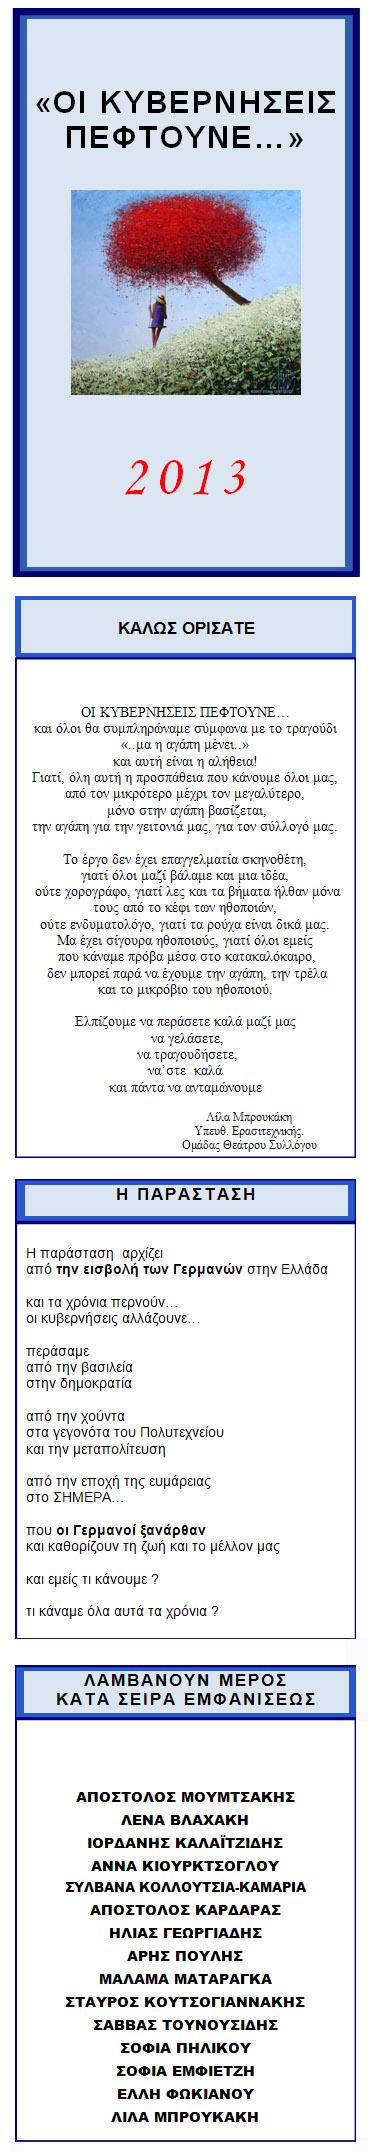 2013_oi_kyverniseis